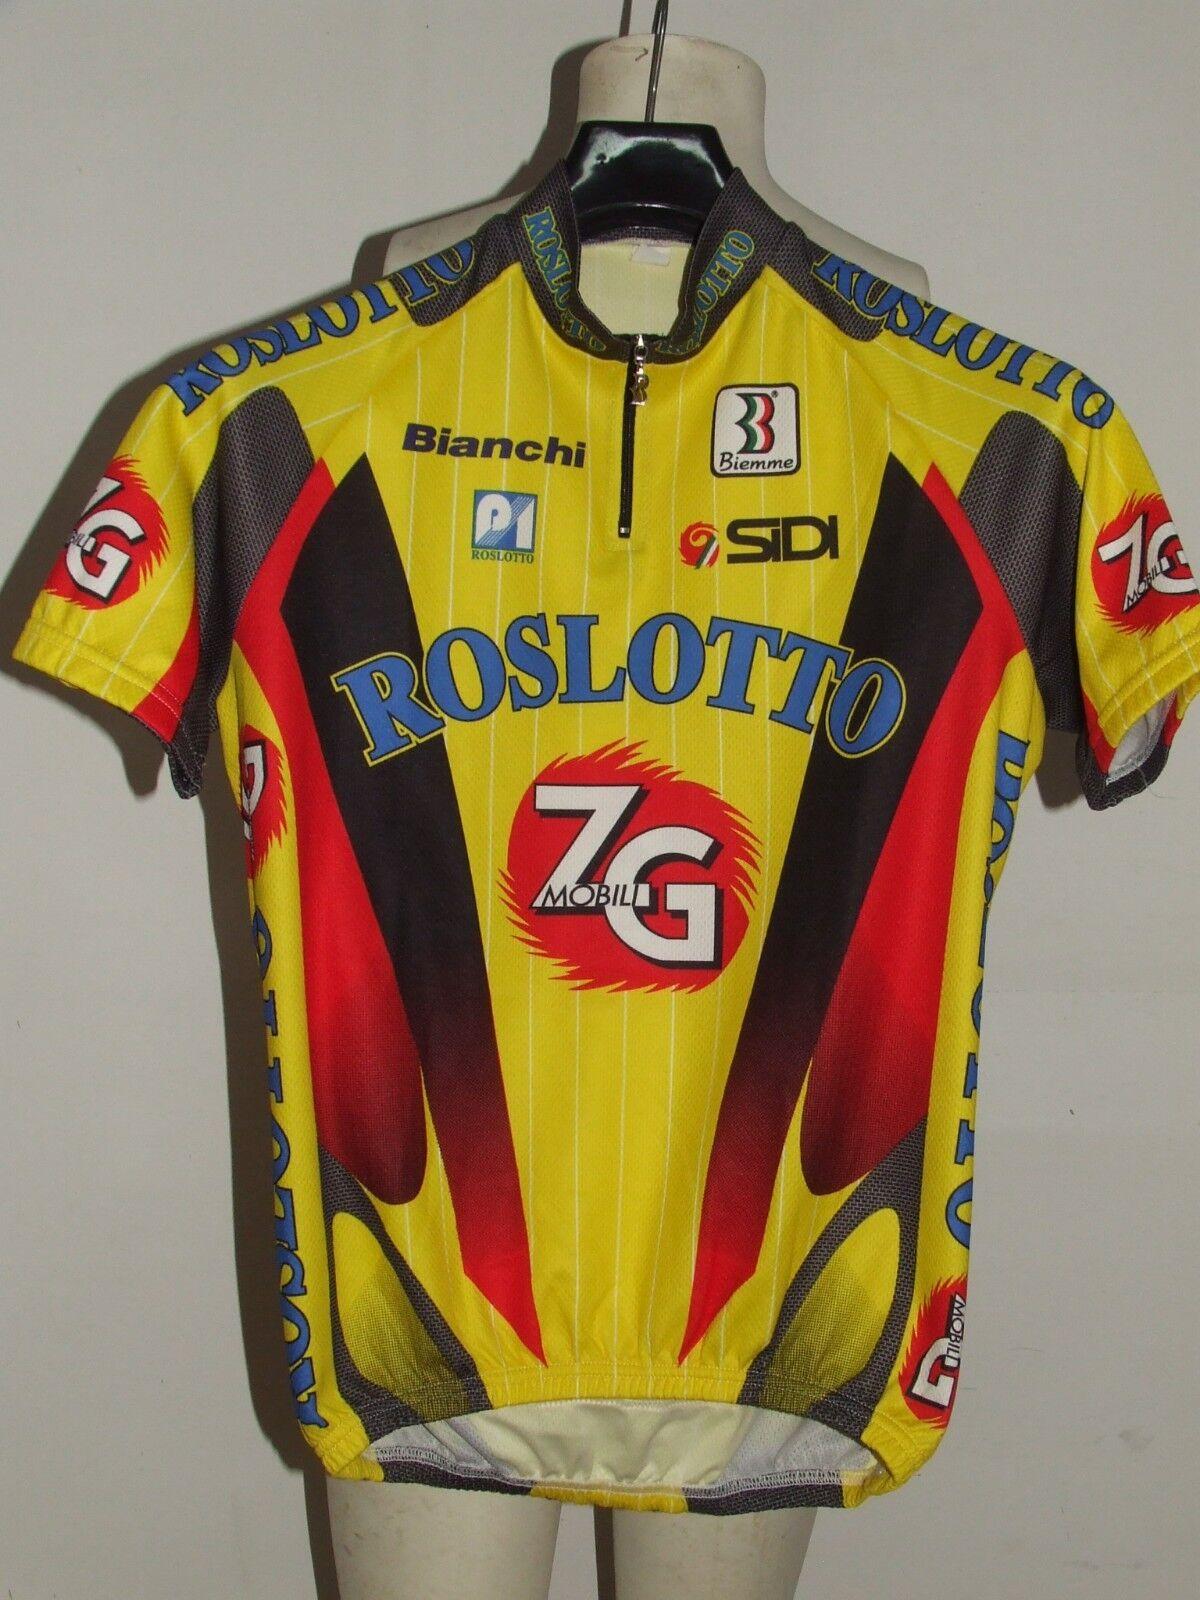 MAGLIA BICI CICLISMO SHIRT MAILLOT CYCLISM TEAM ZG ROSLOTTO BIEMME  tg. M  factory outlet online discount sale